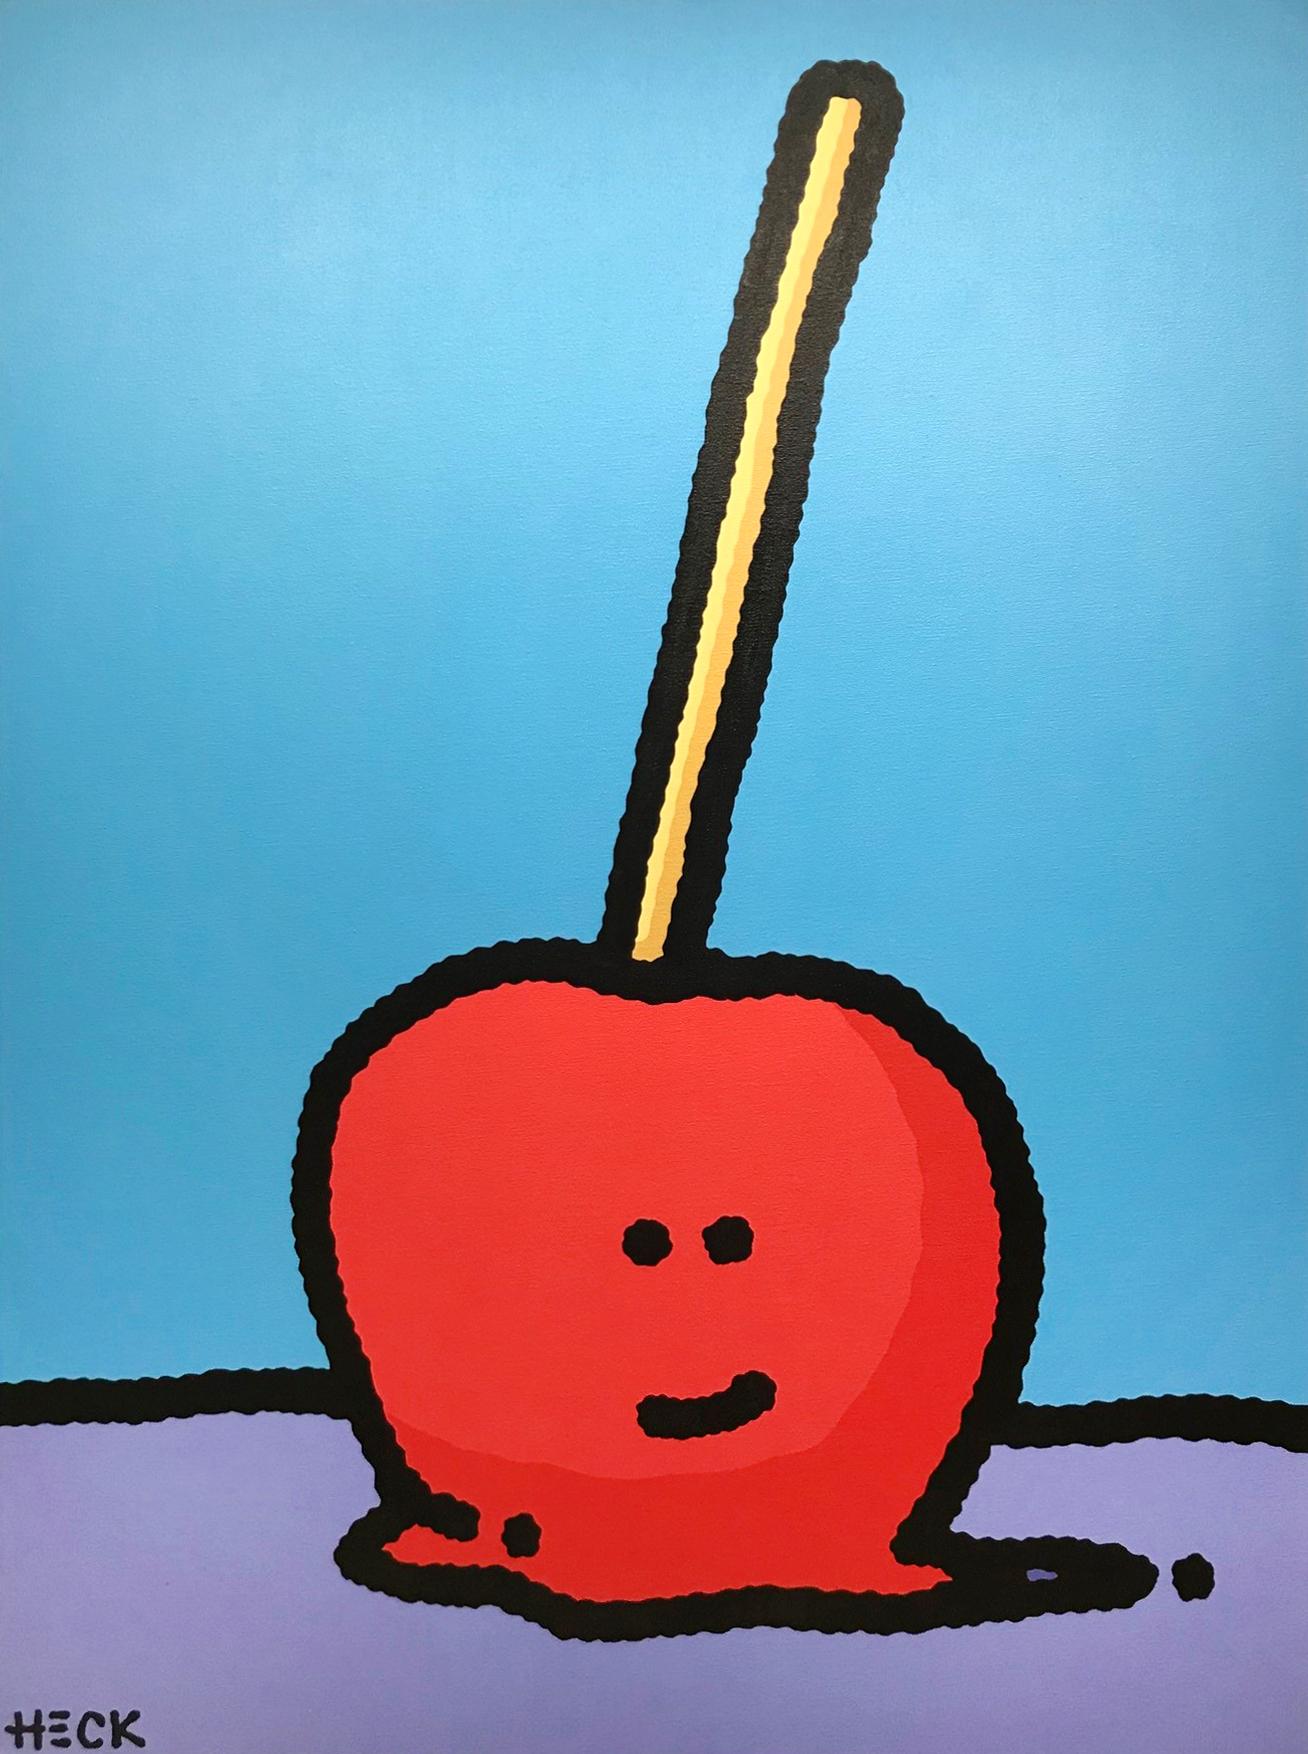 Ed Heck - Candy Apple I , 6575-006-171